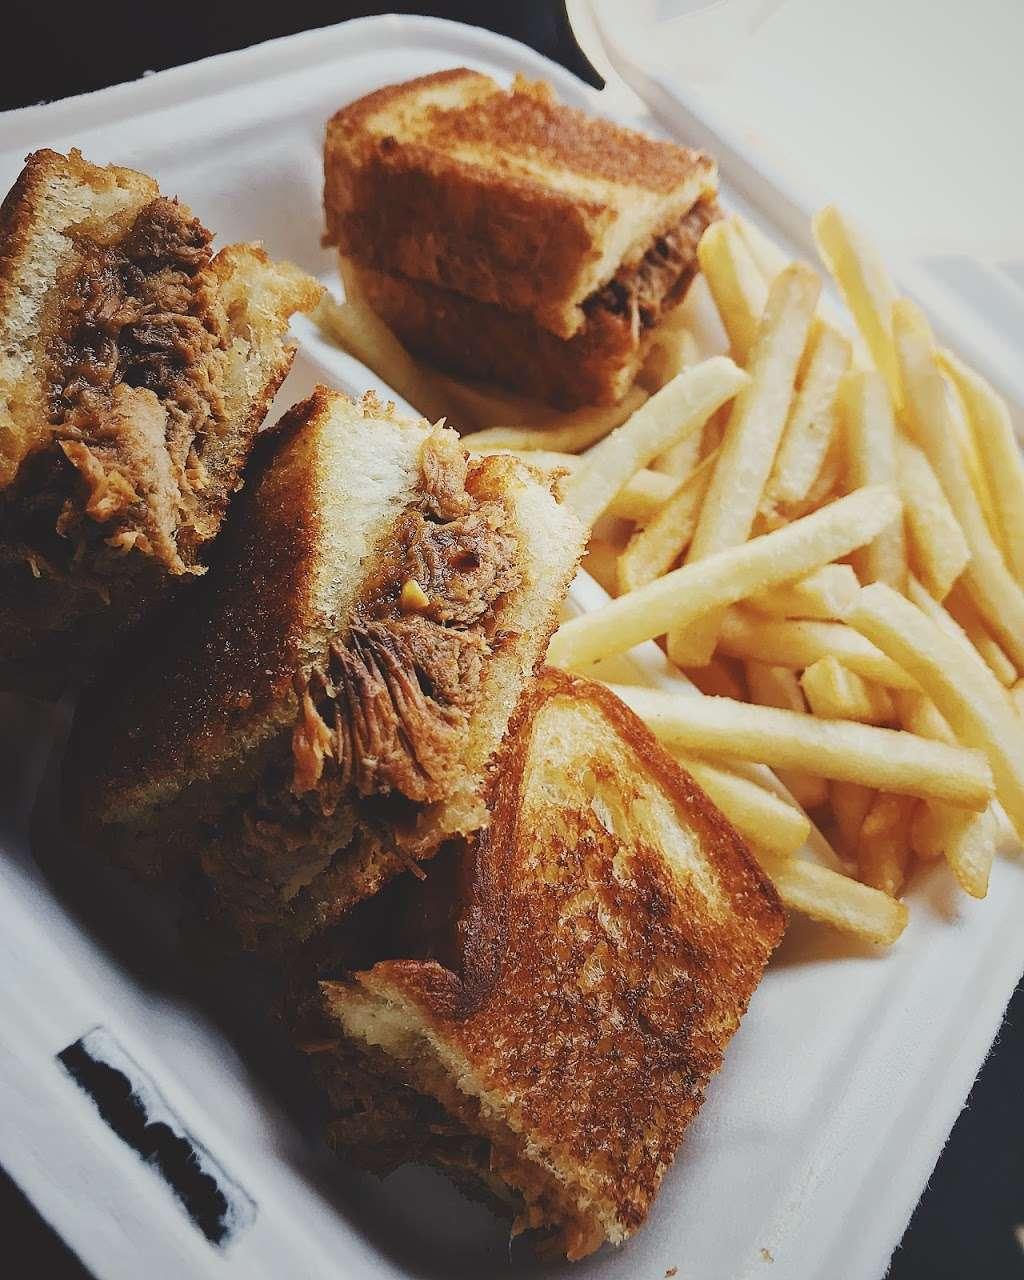 Mordi's Sandwich Shop - restaurant    Photo 4 of 10   Address: 320 Communipaw Ave, Jersey City, NJ 07304, USA   Phone: (551) 697-4805